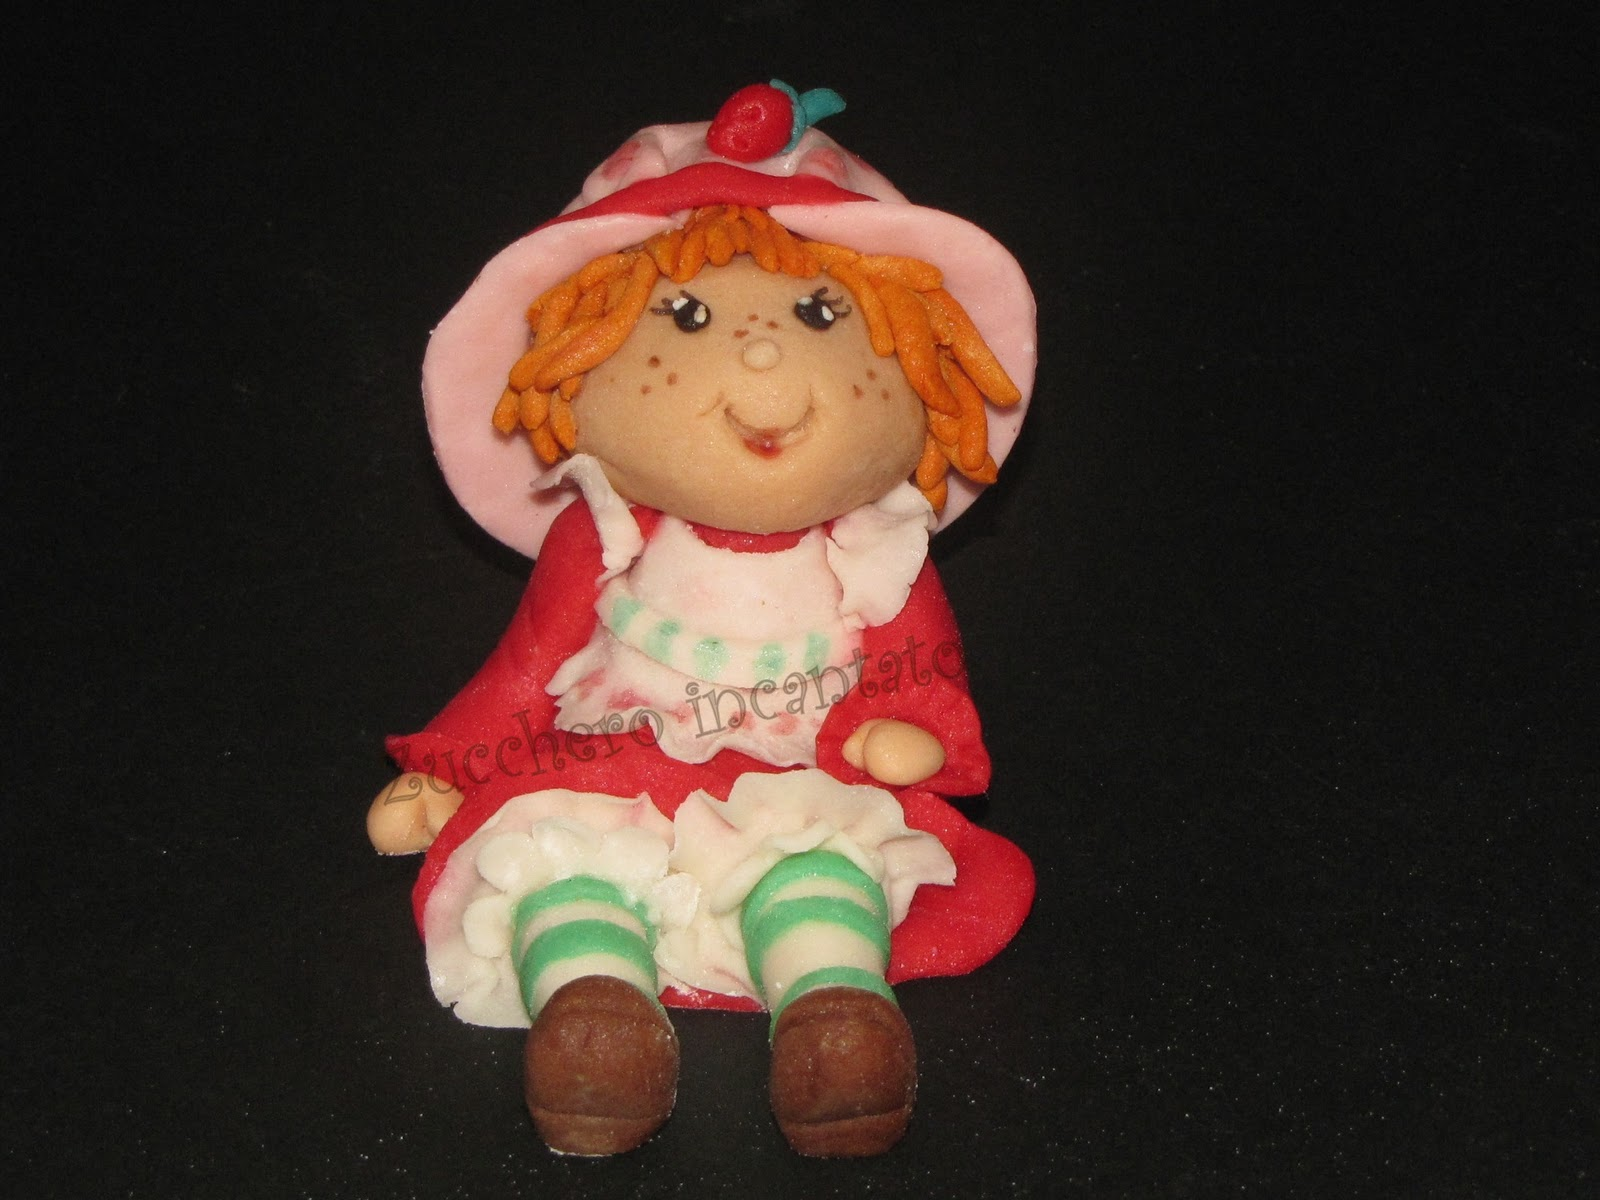 Zucchero incantato strawberry shortcake fragolina dolcecuore